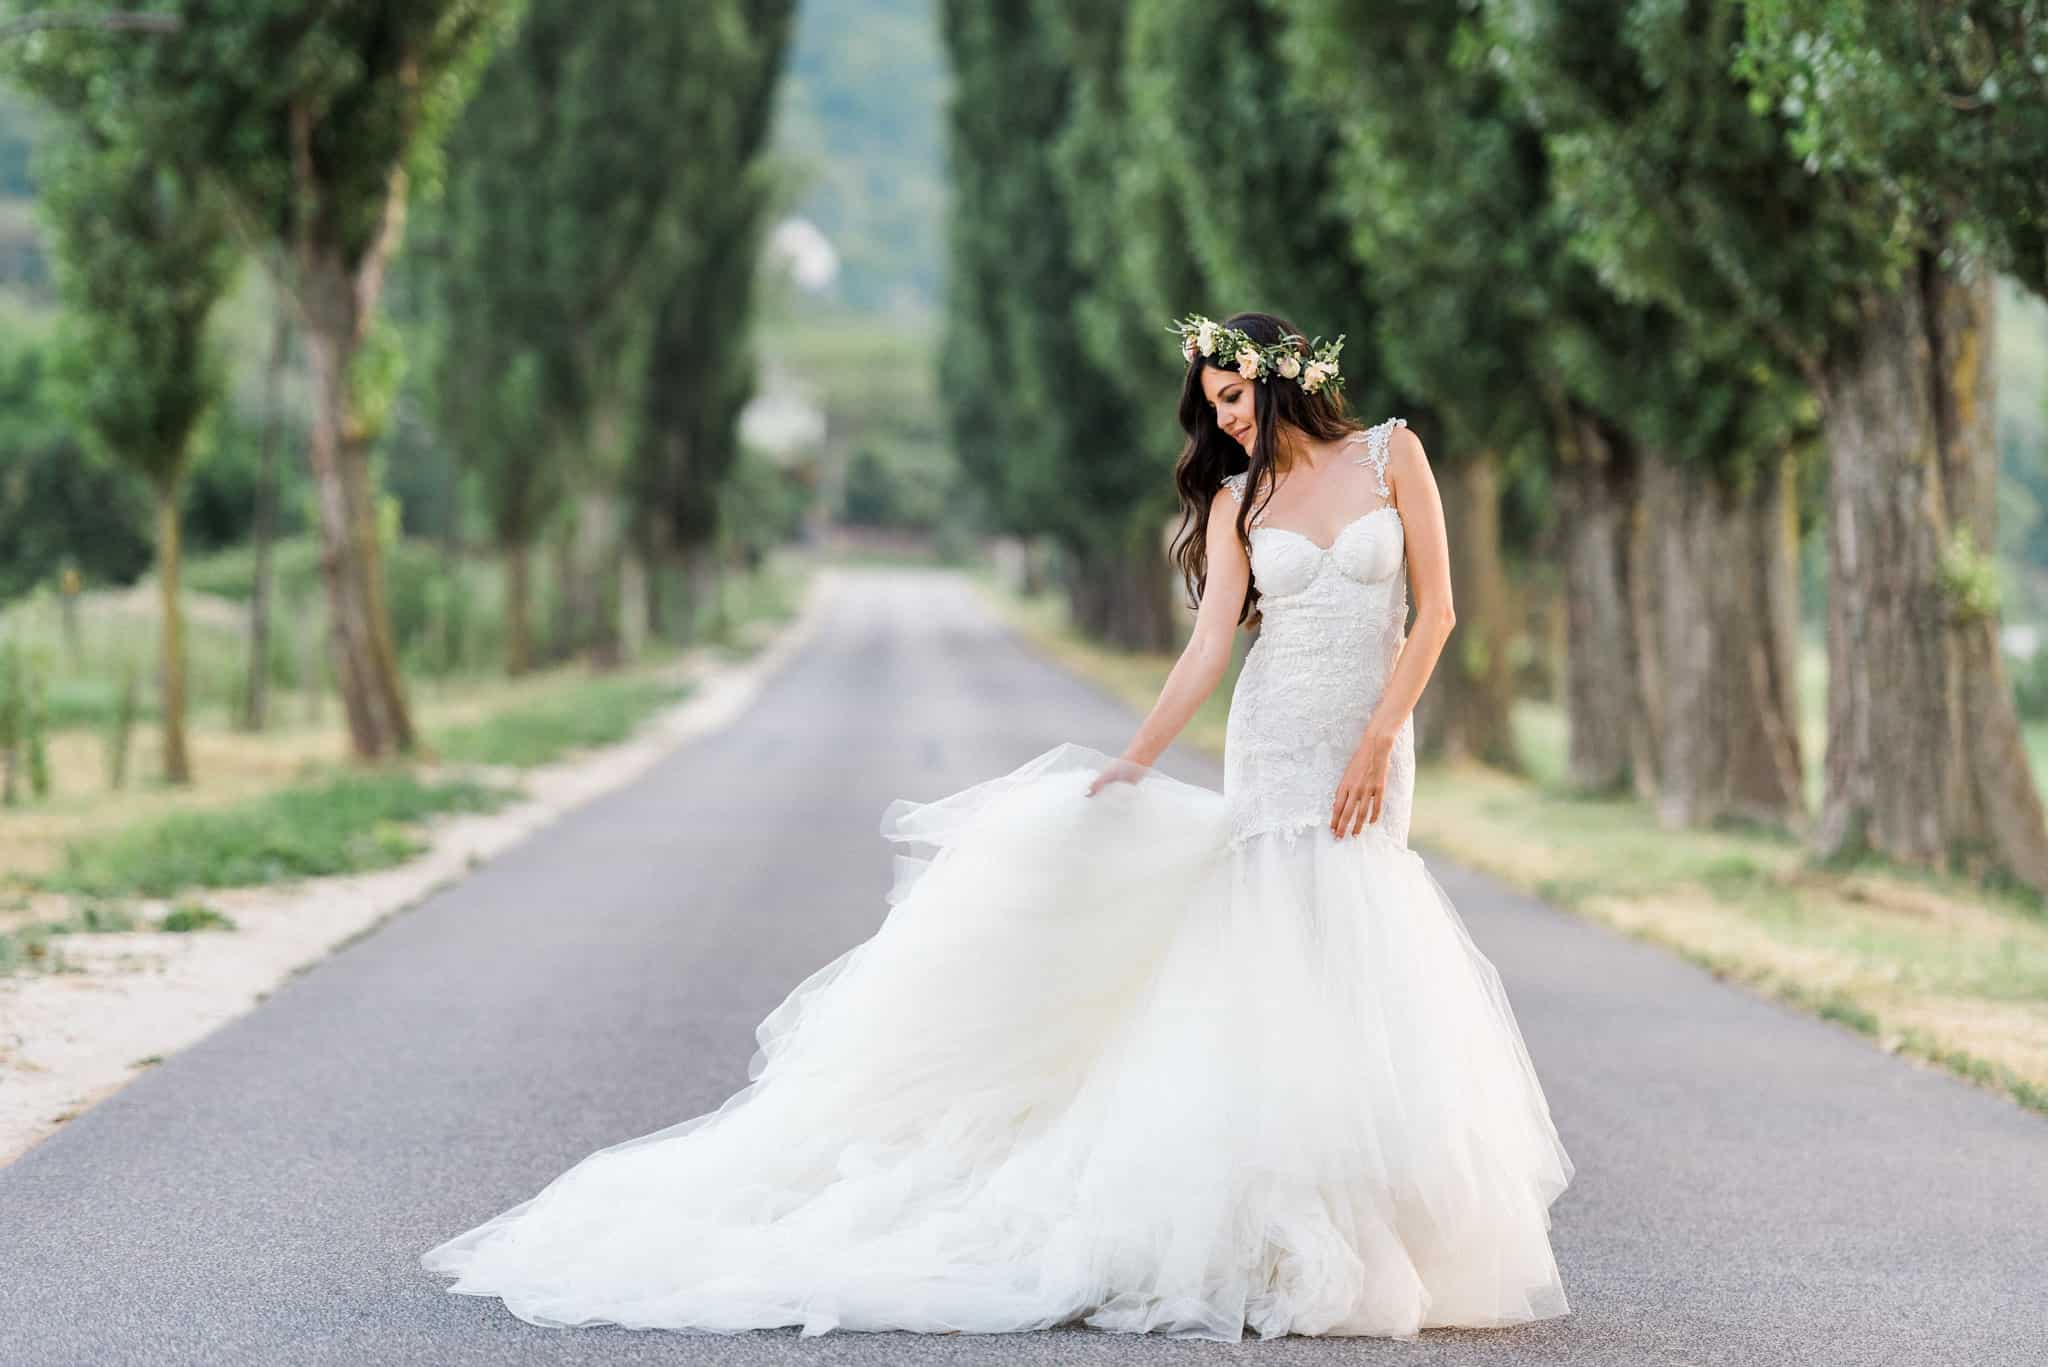 Wedoverhills_Prewedding_Italy_Fineart_Galia_Lahav_0053